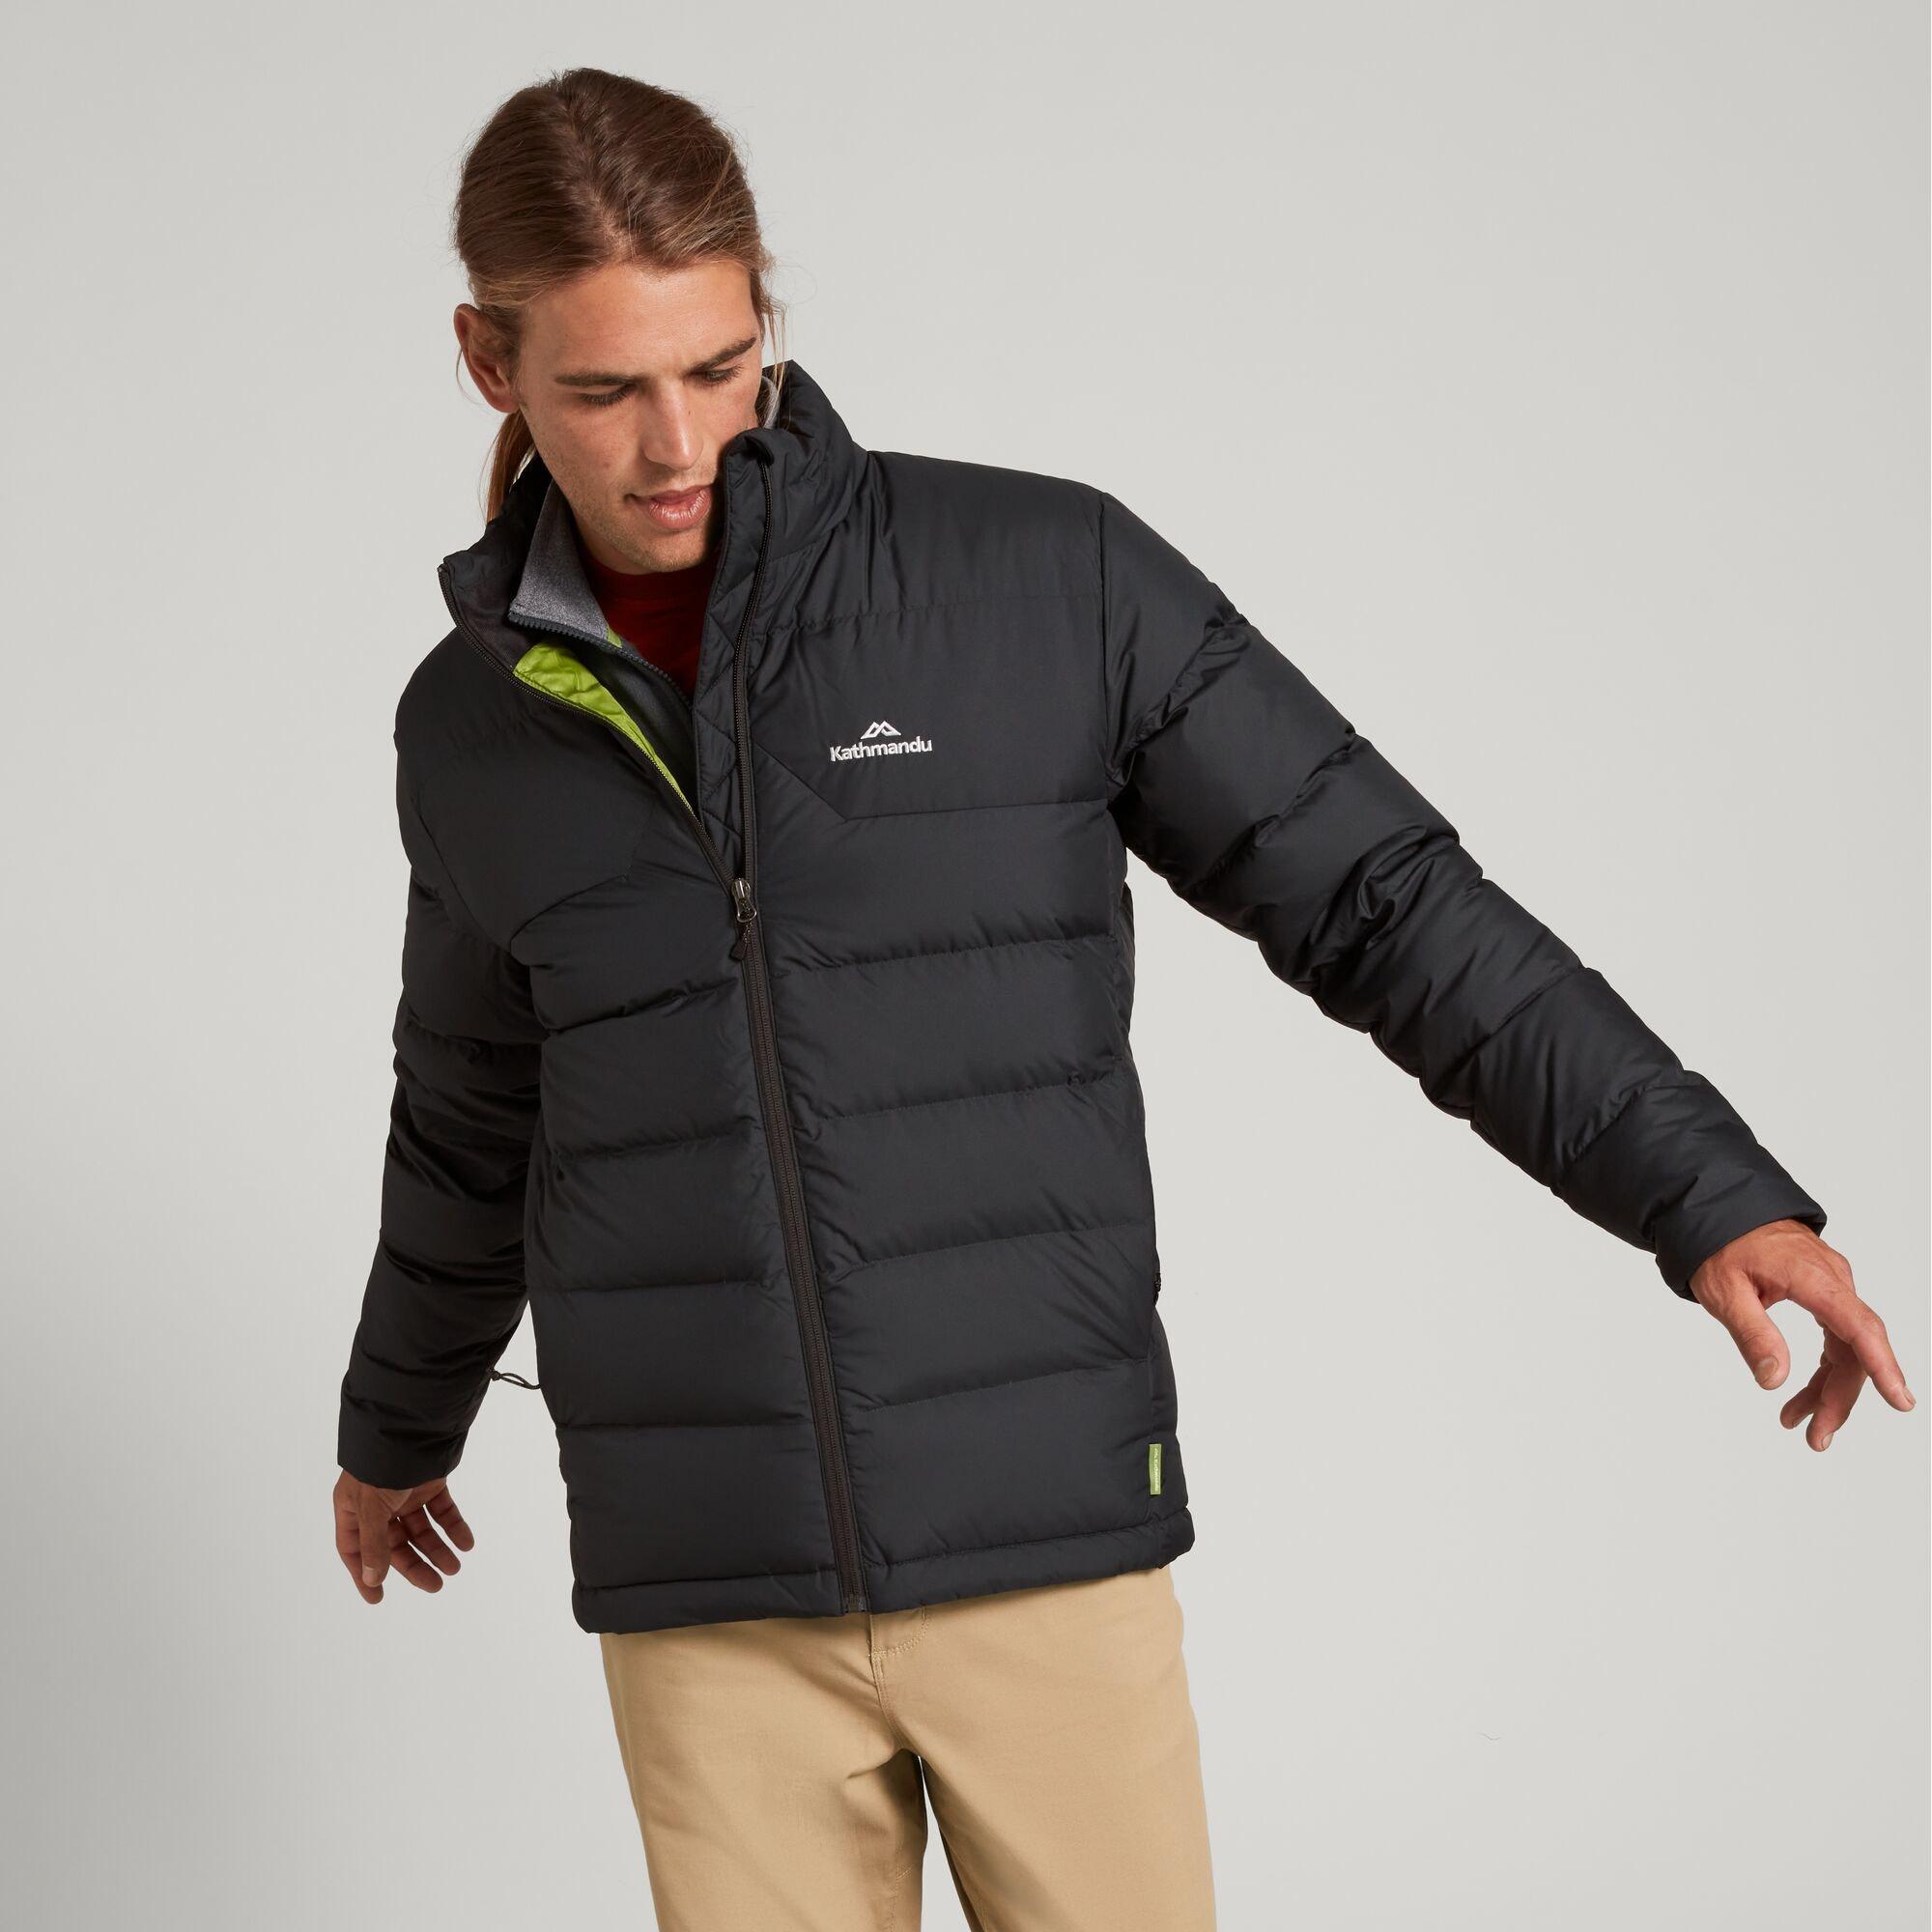 thumbnail 15 - NEW Kathmandu Epiq Mens 600 Fill Down Puffer Warm Outdoor Winter Jacket